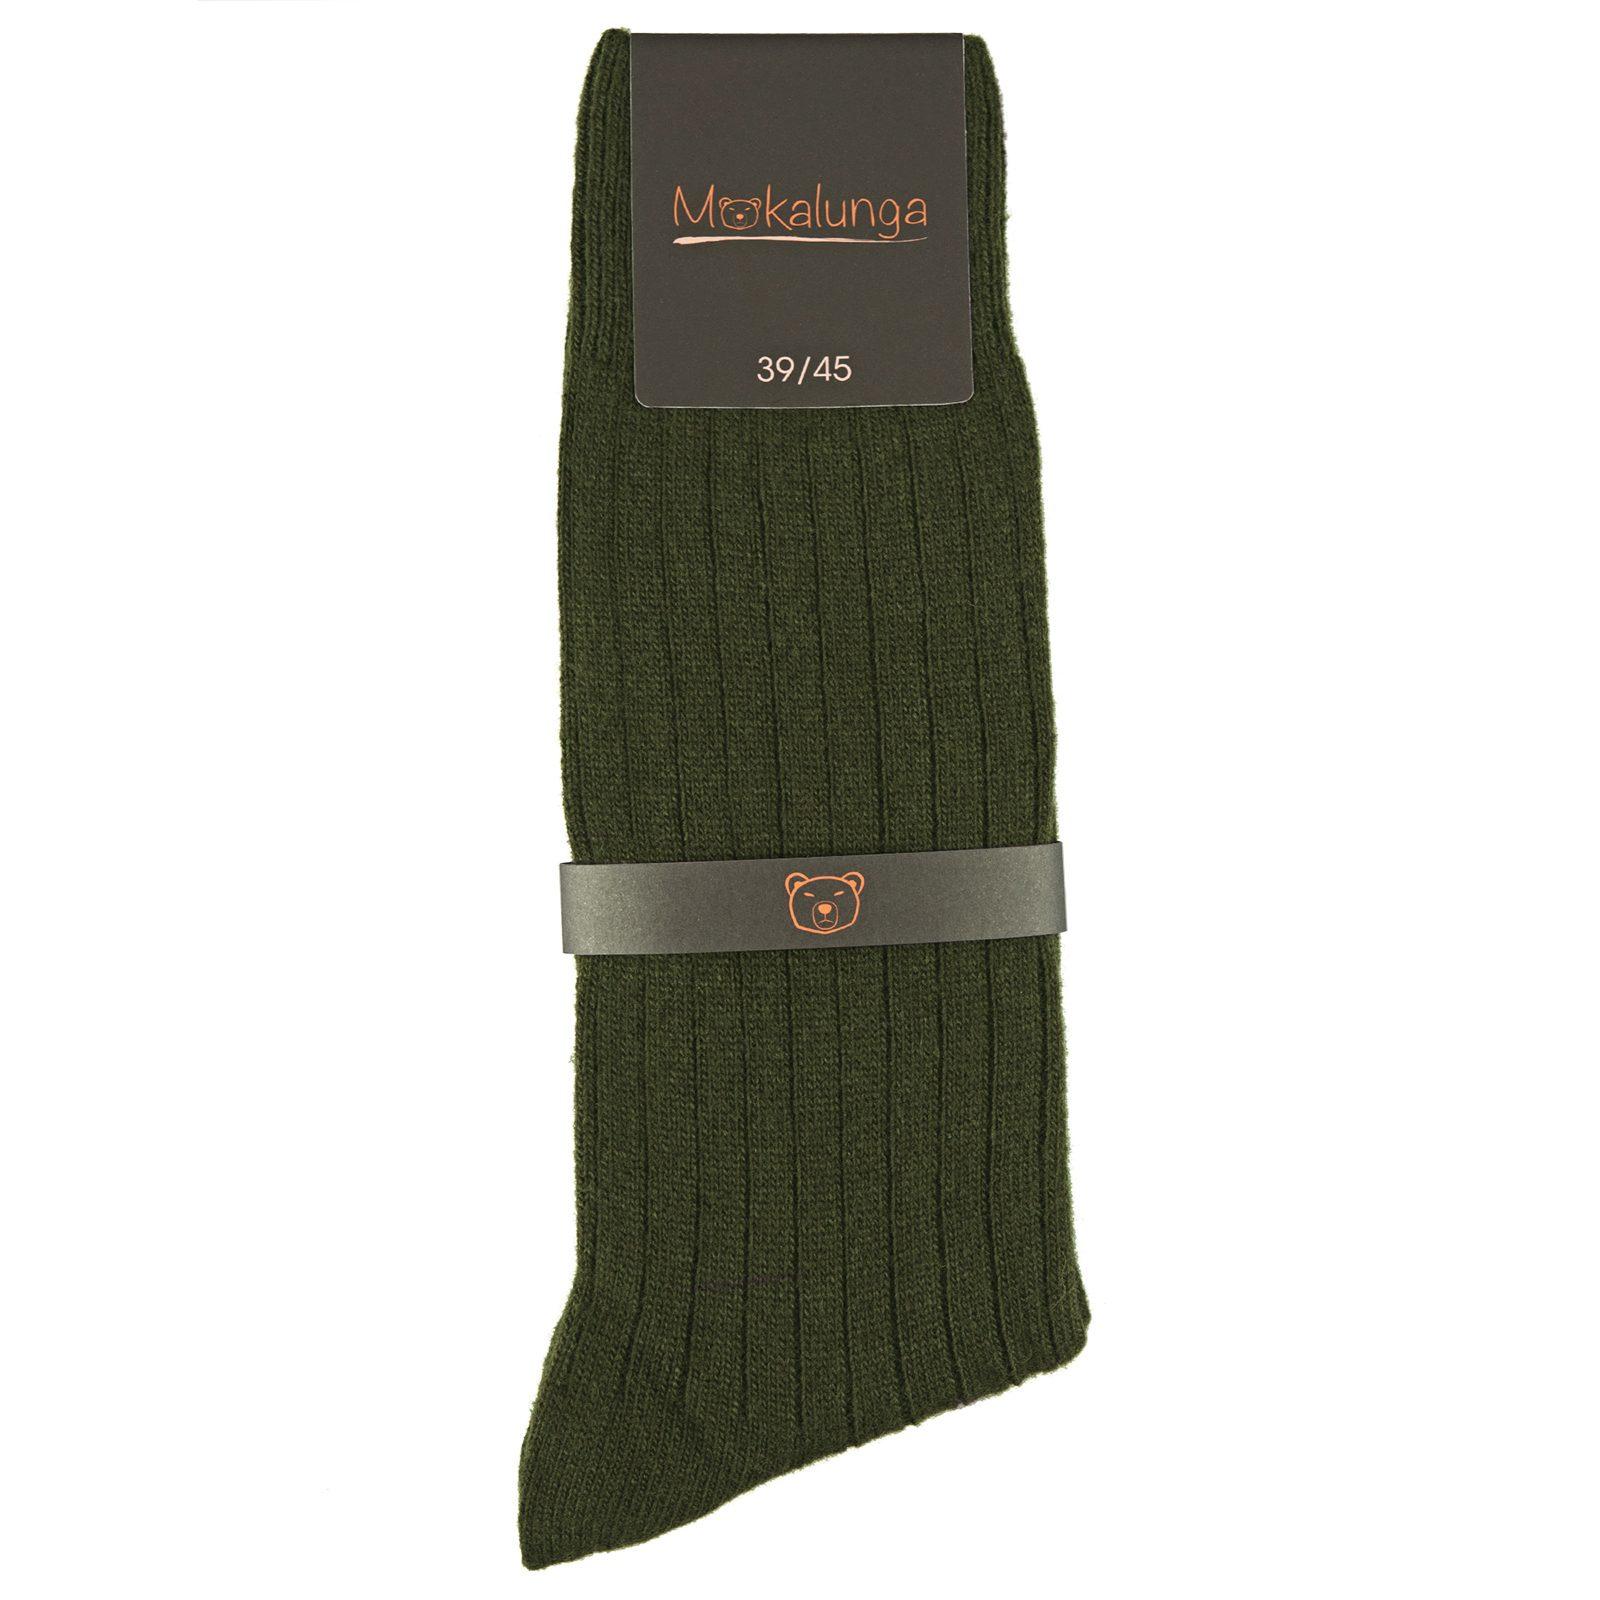 http://lookbook.allee-du-foulard.fr/wp-content/uploads/2018/11/CH-00237-B16-chaussettes-homme-laine-cachemire-kaki-1600x1600.jpg